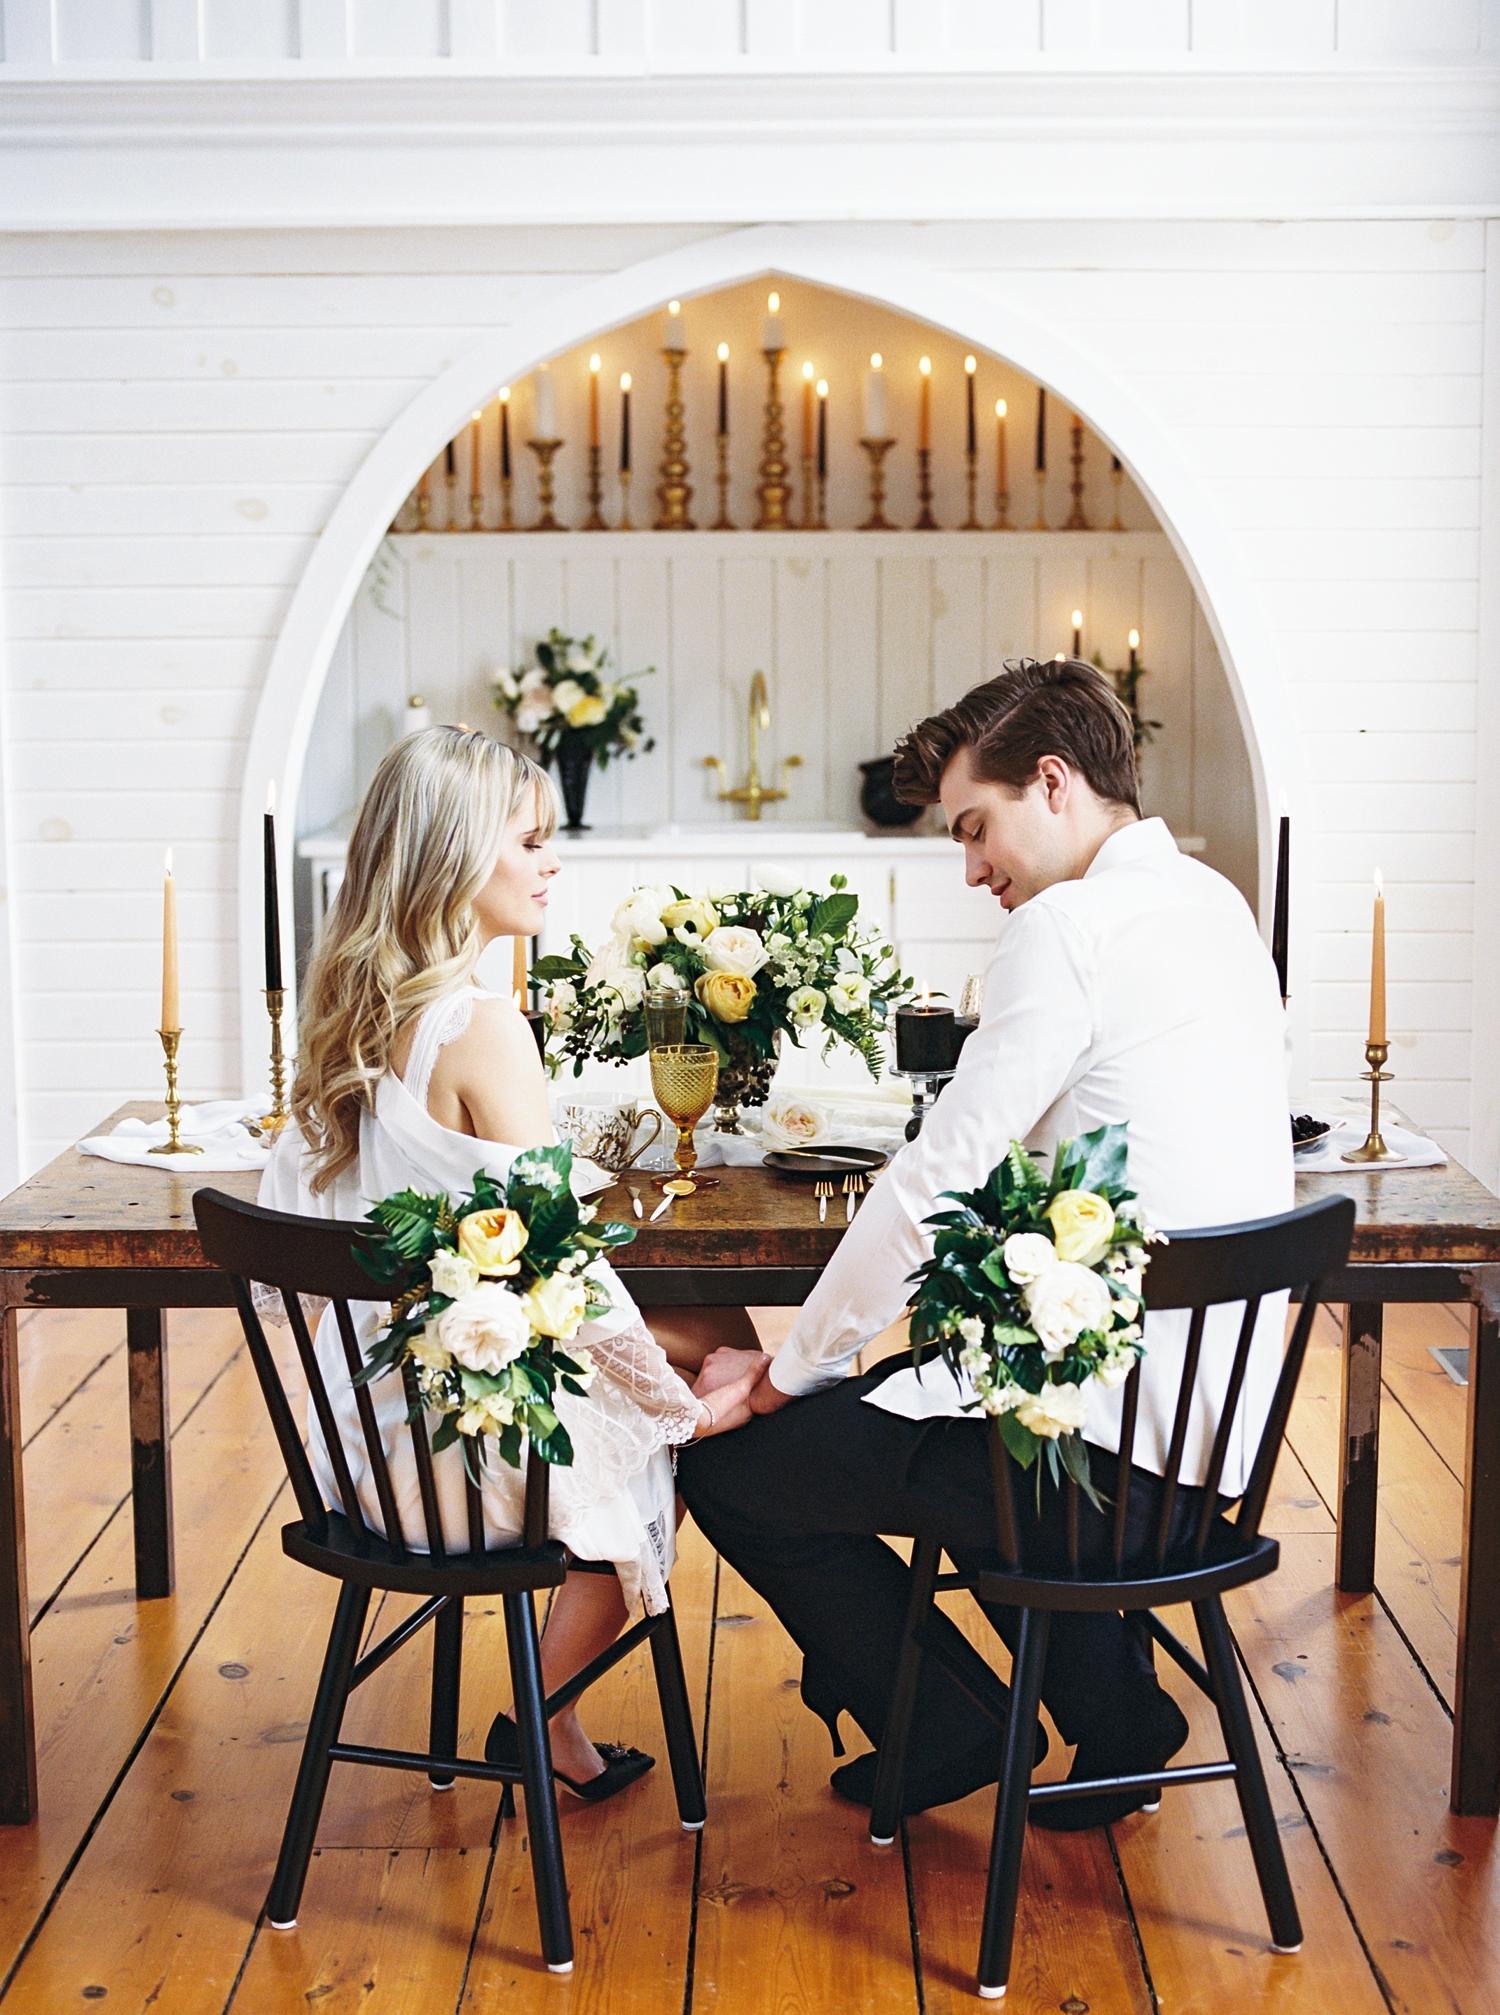 Rosenlee Photography Wedding Inspiration_0022.jpg